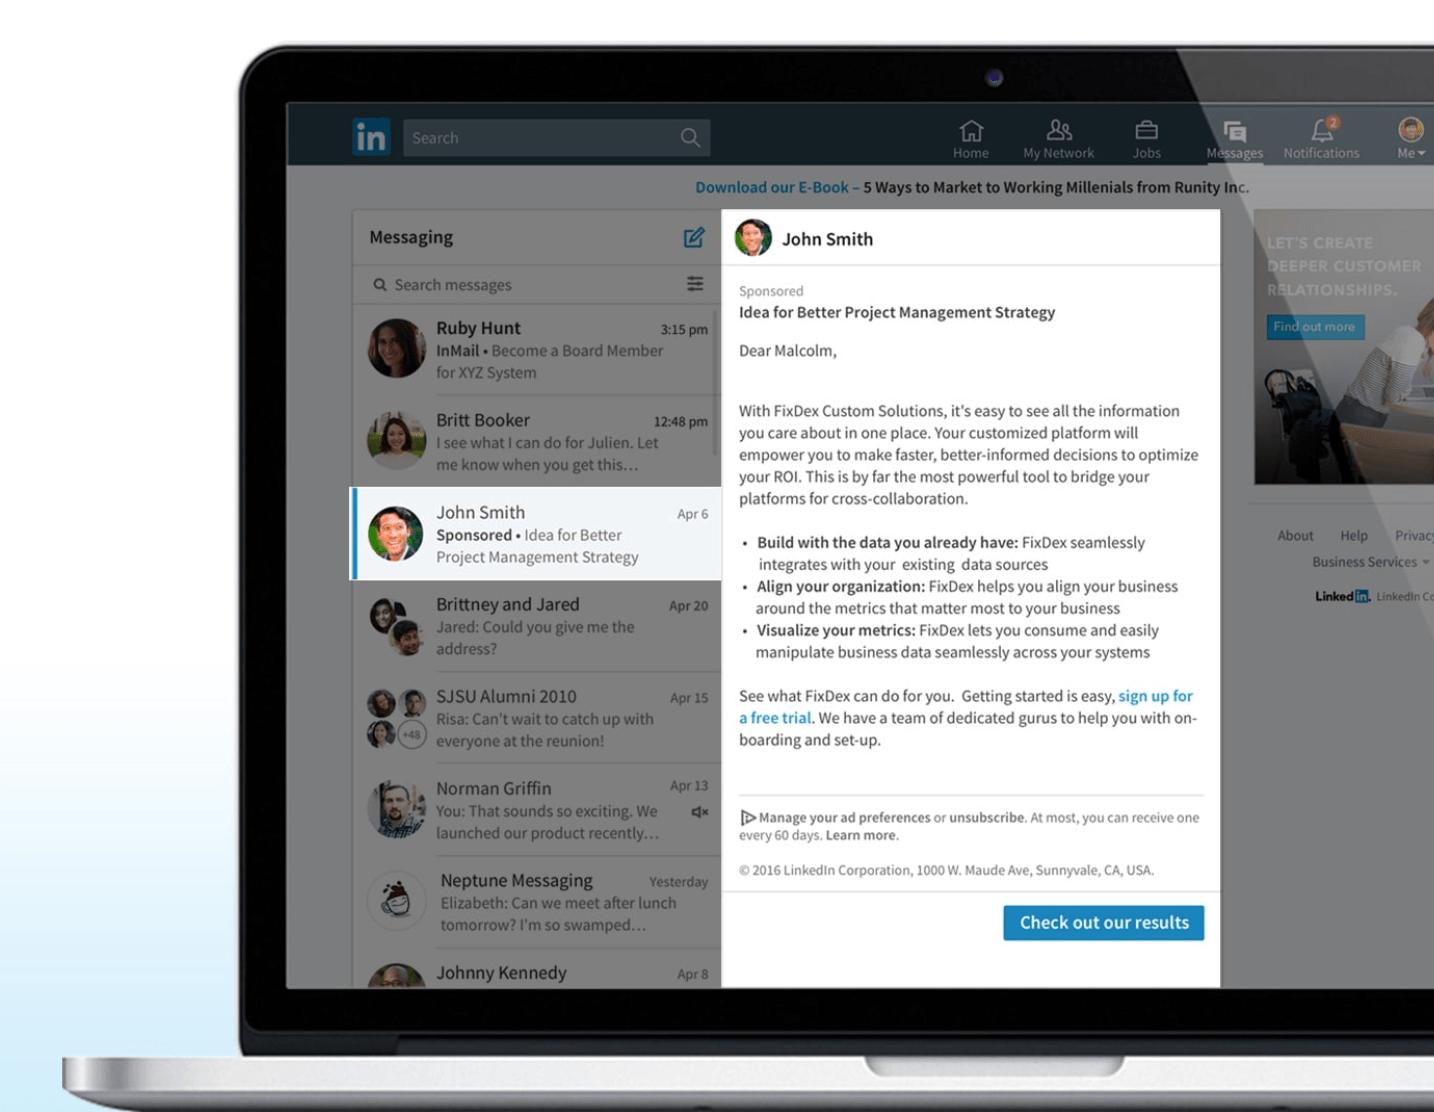 LinkedIn Ads Sponsored InMail